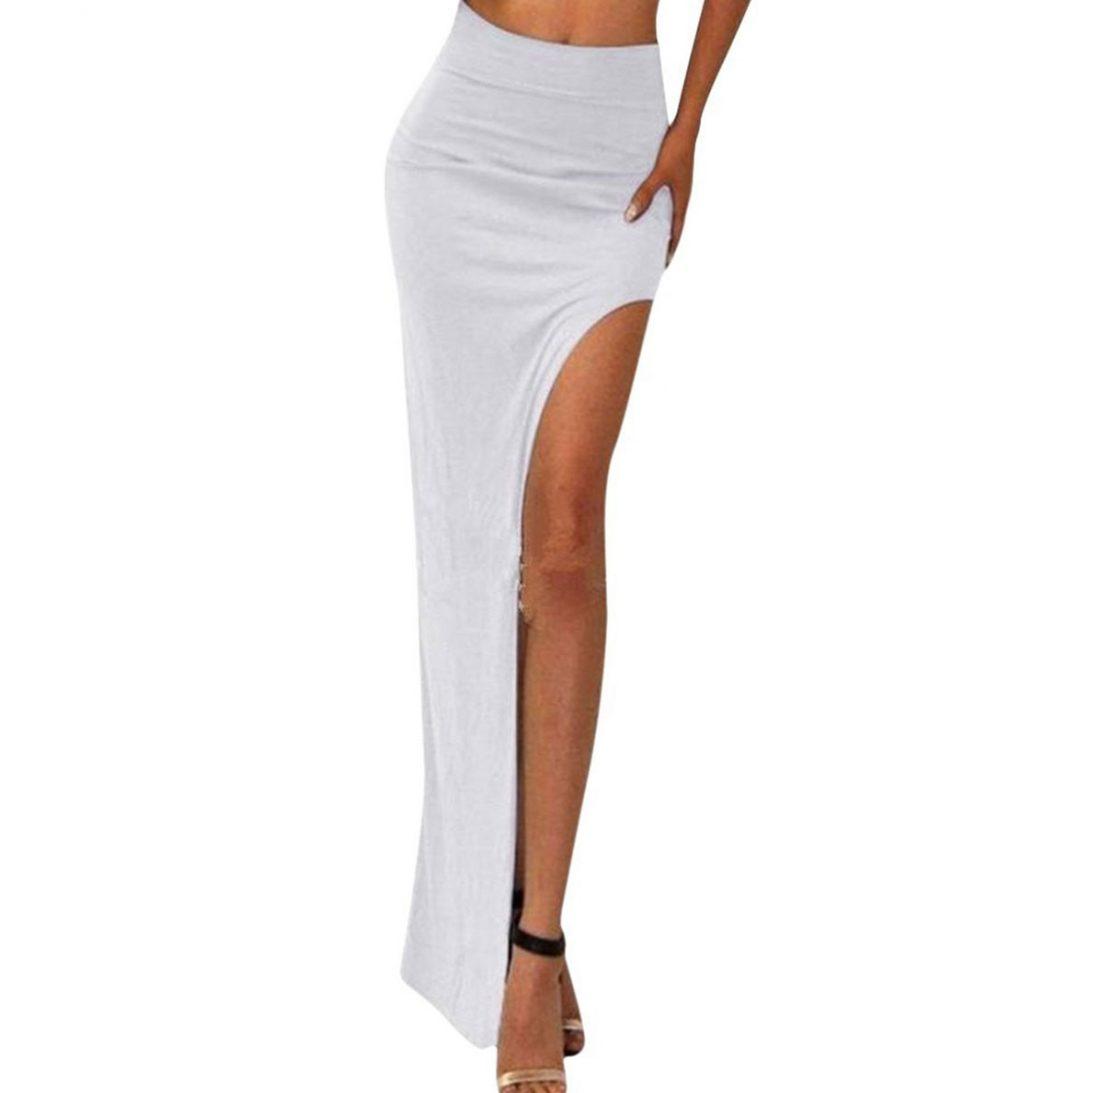 M0182 white1 Maxi Skirts maureens.com boutique